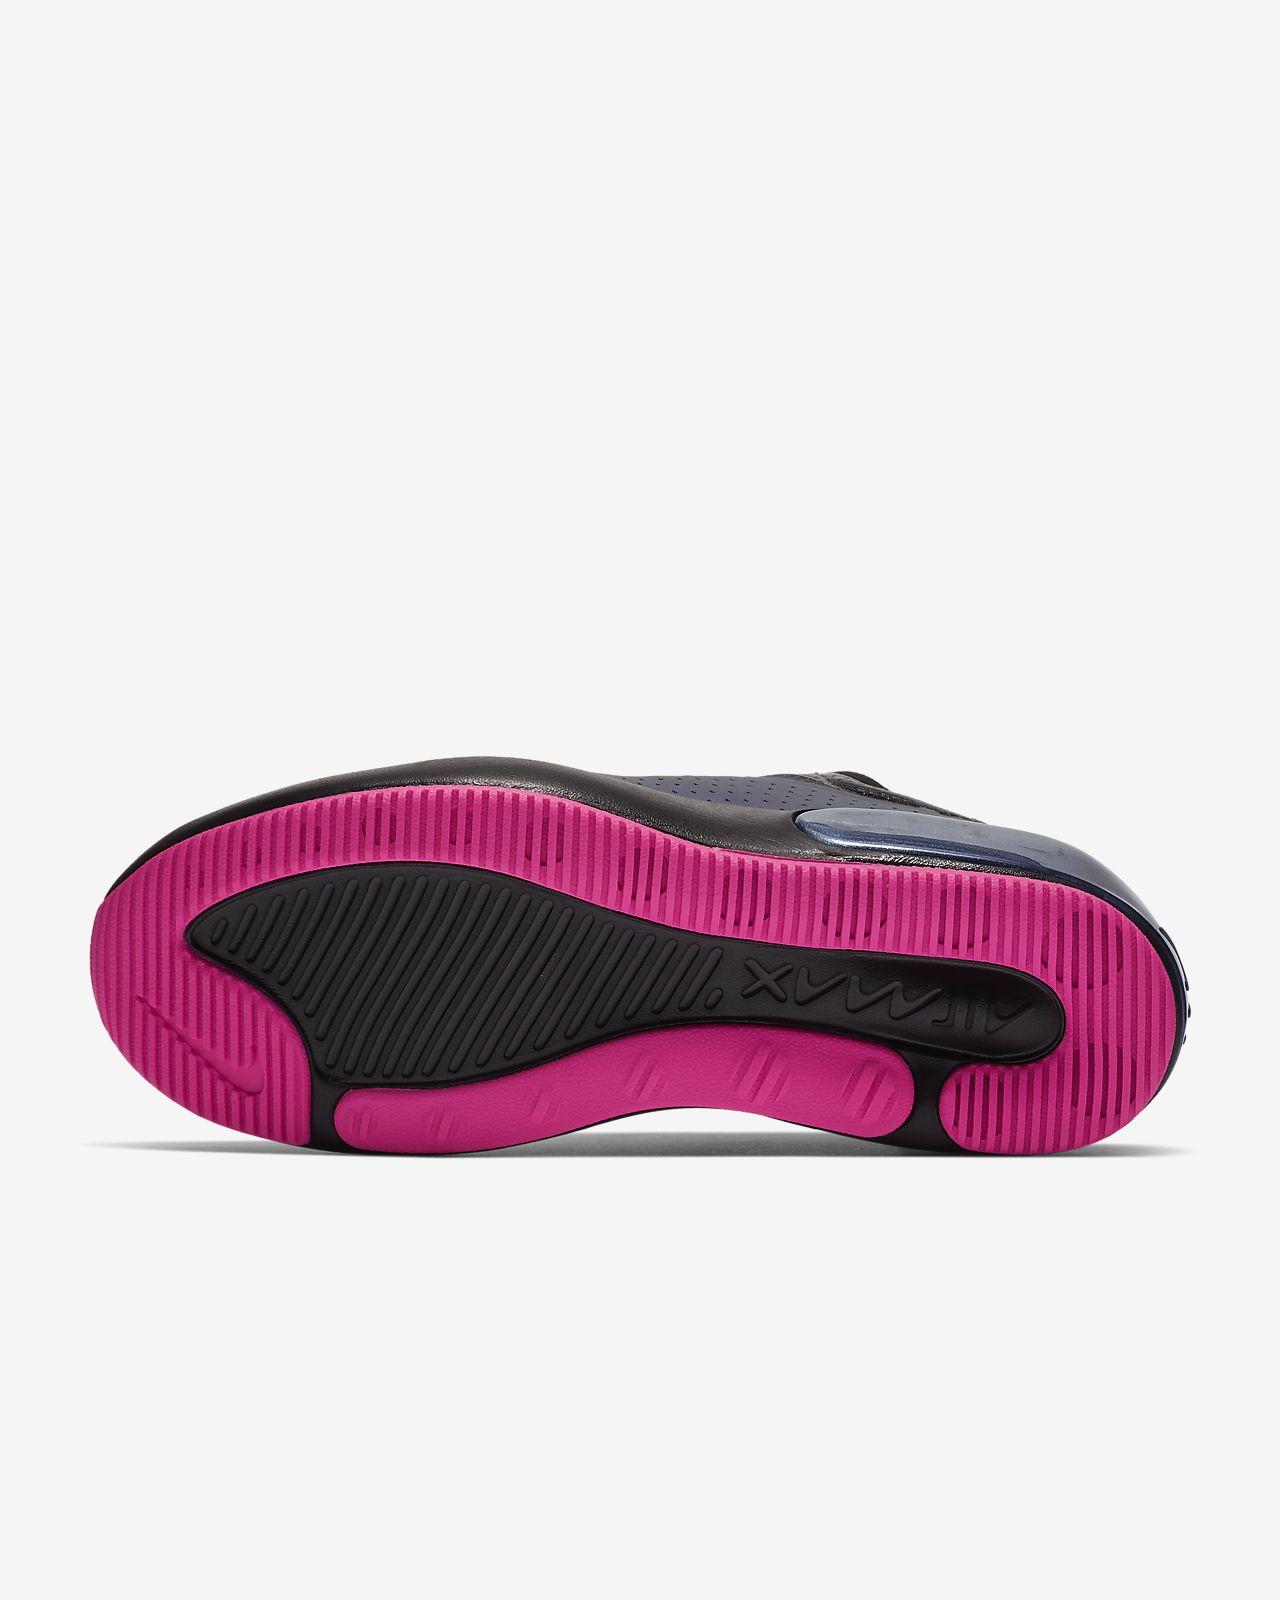 Zapatillas Nike Air Max Zero Mujer. Us 8.